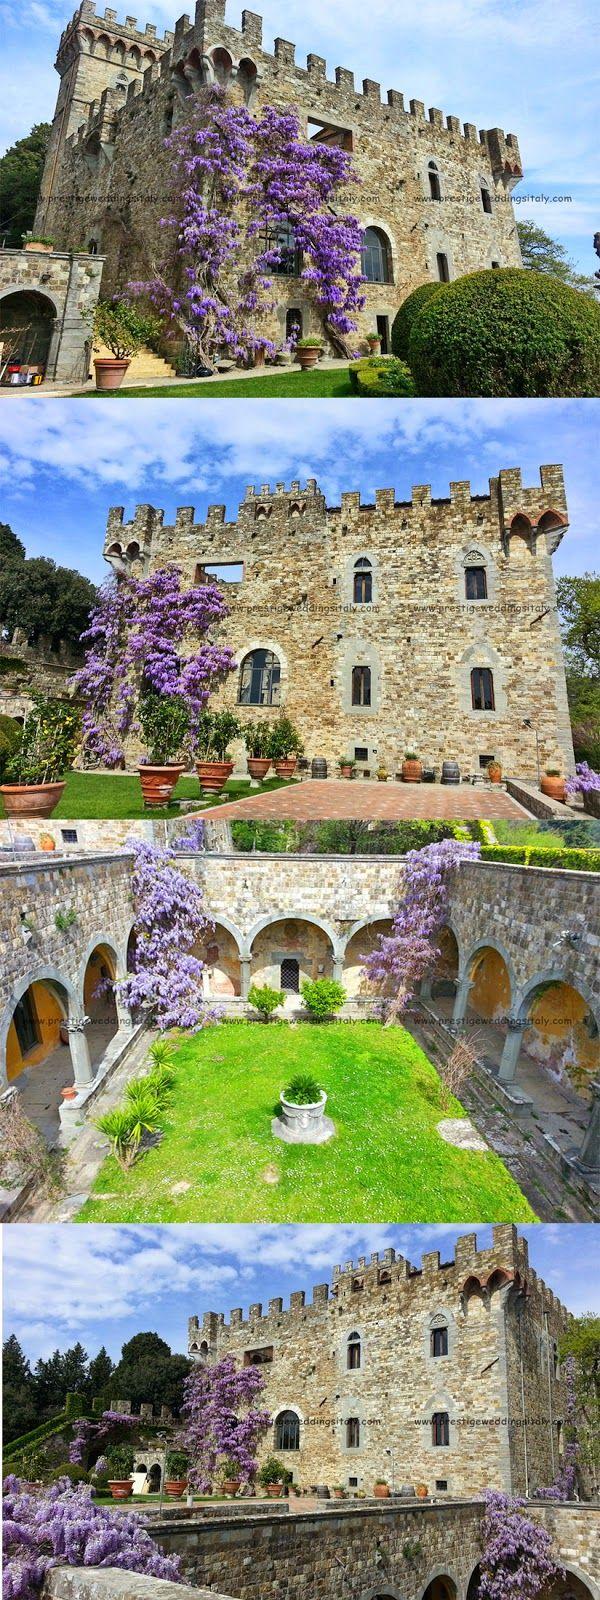 Villas, castles meeting and wedding in Italy